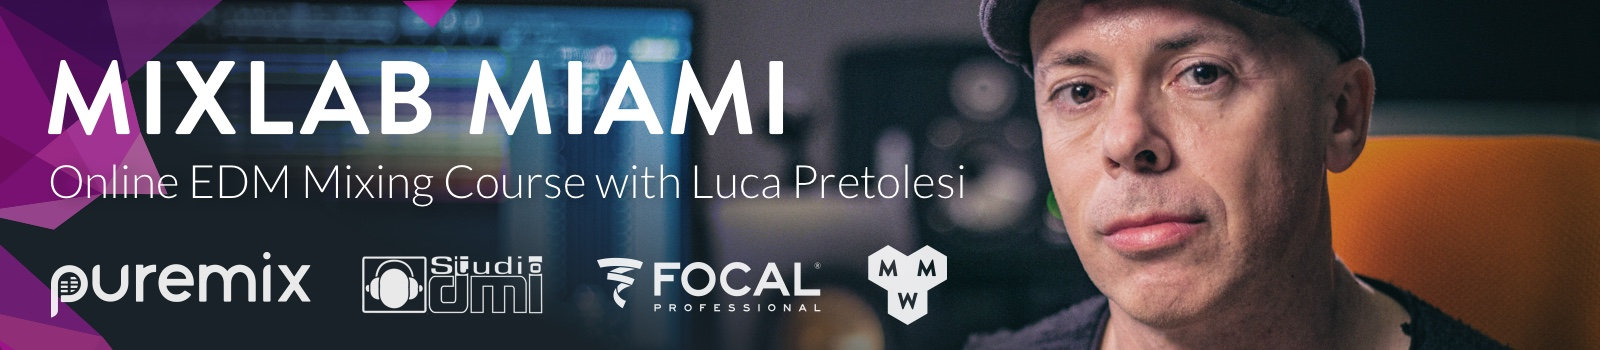 MixLab Miami - Online EDM Mixing Course with Luca Pretolesi